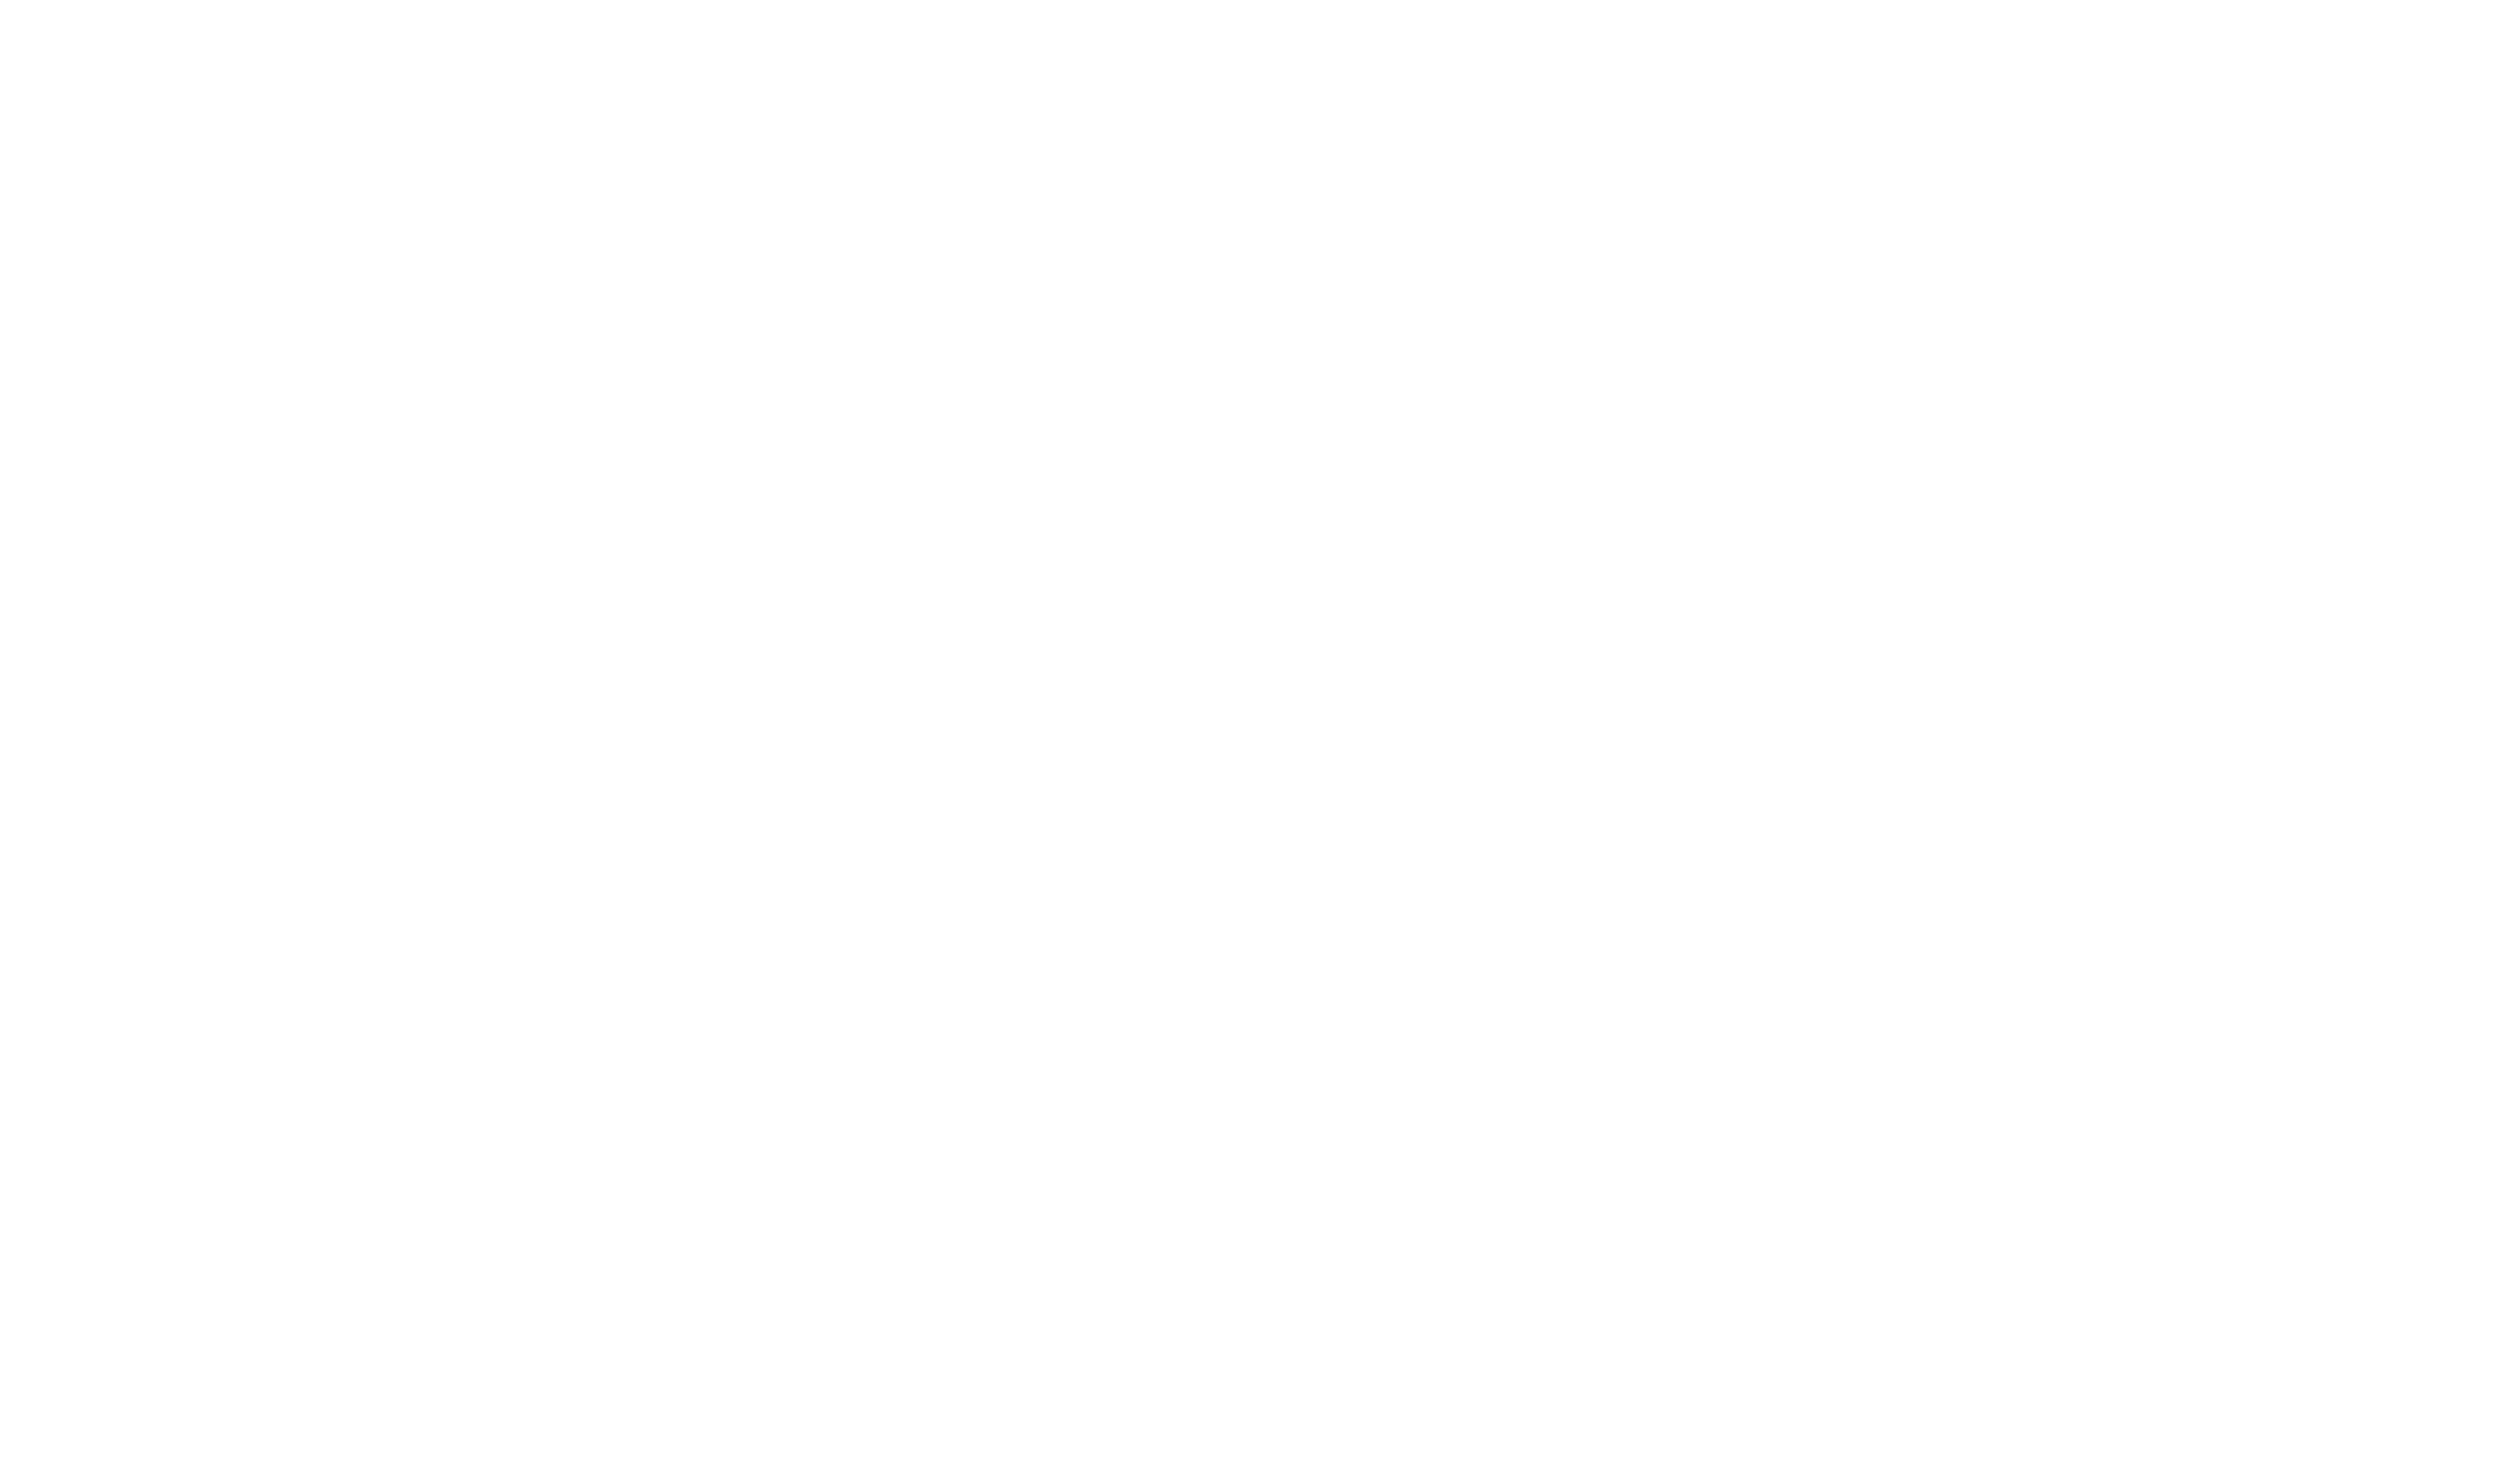 Andreas Ehrenhöfer